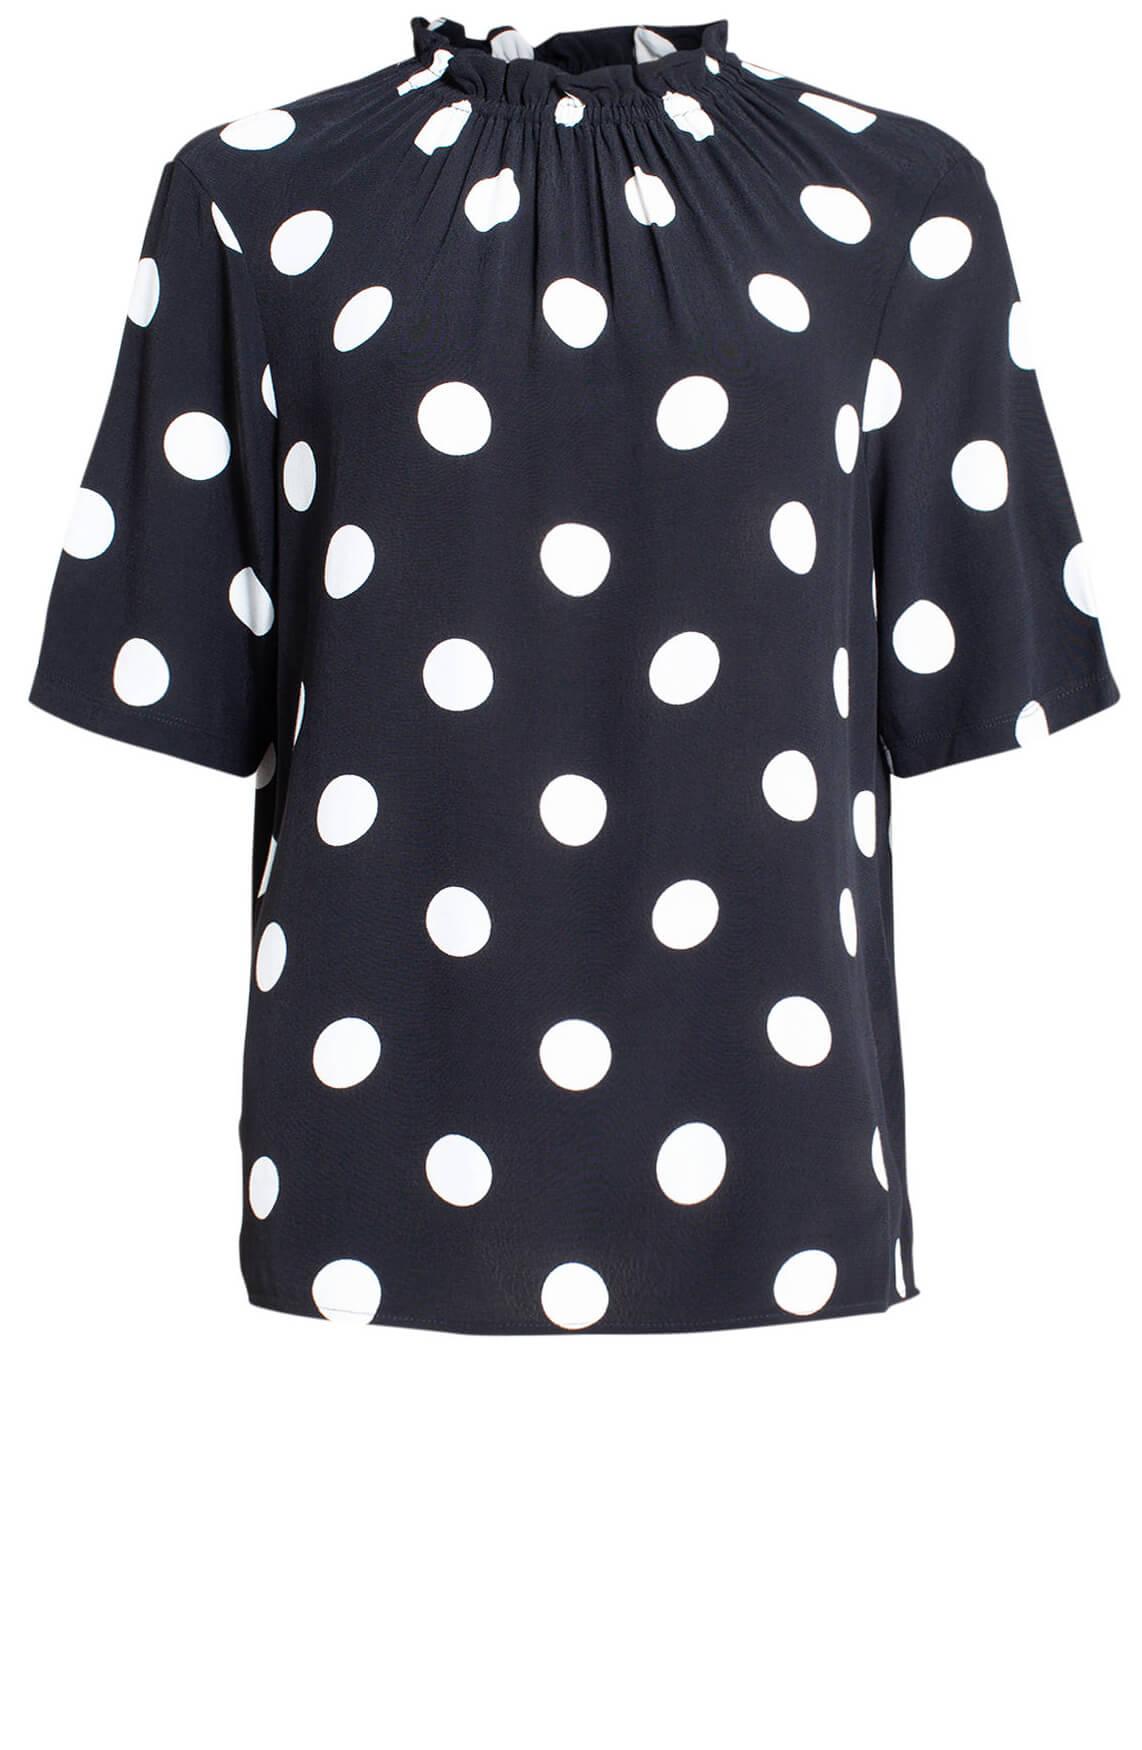 Anna Dames Polkadot blousetop zwart